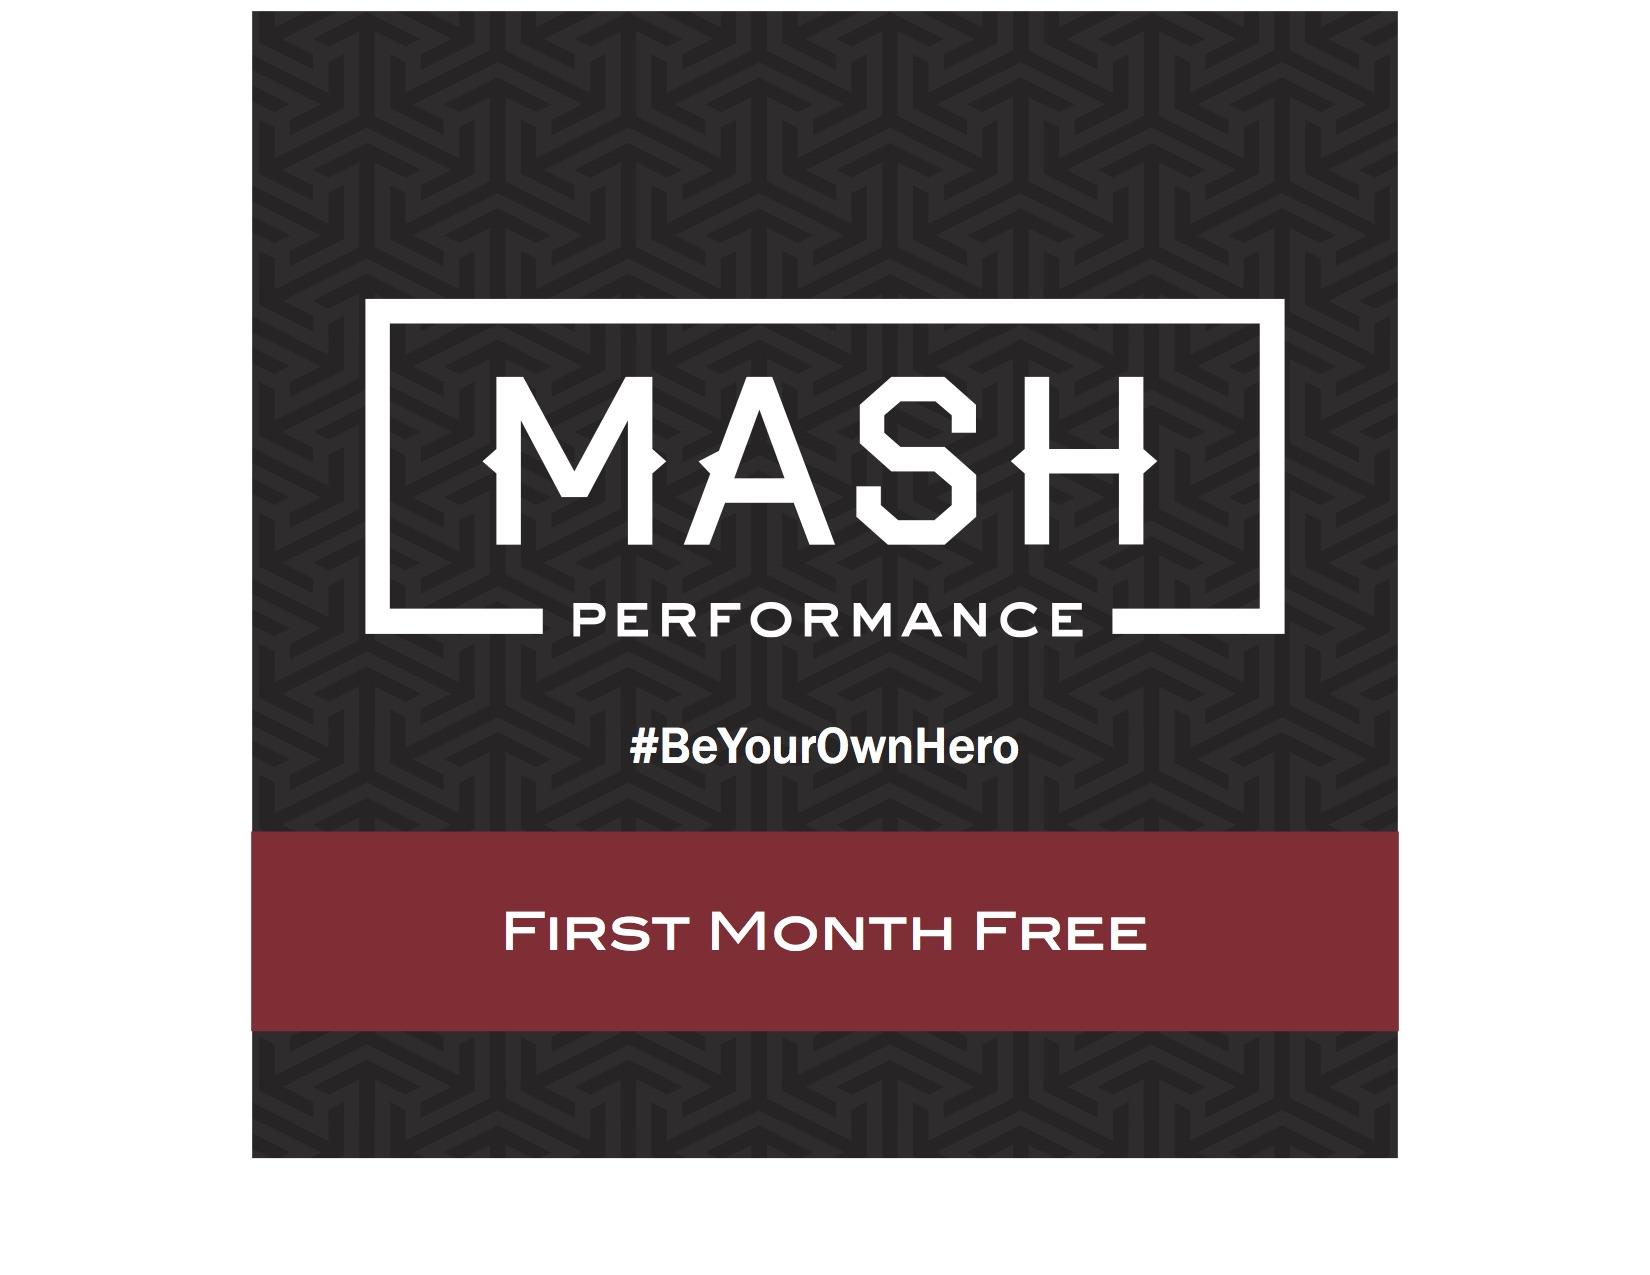 Mash_Performance_Brandmark_black_FINAL.jpg